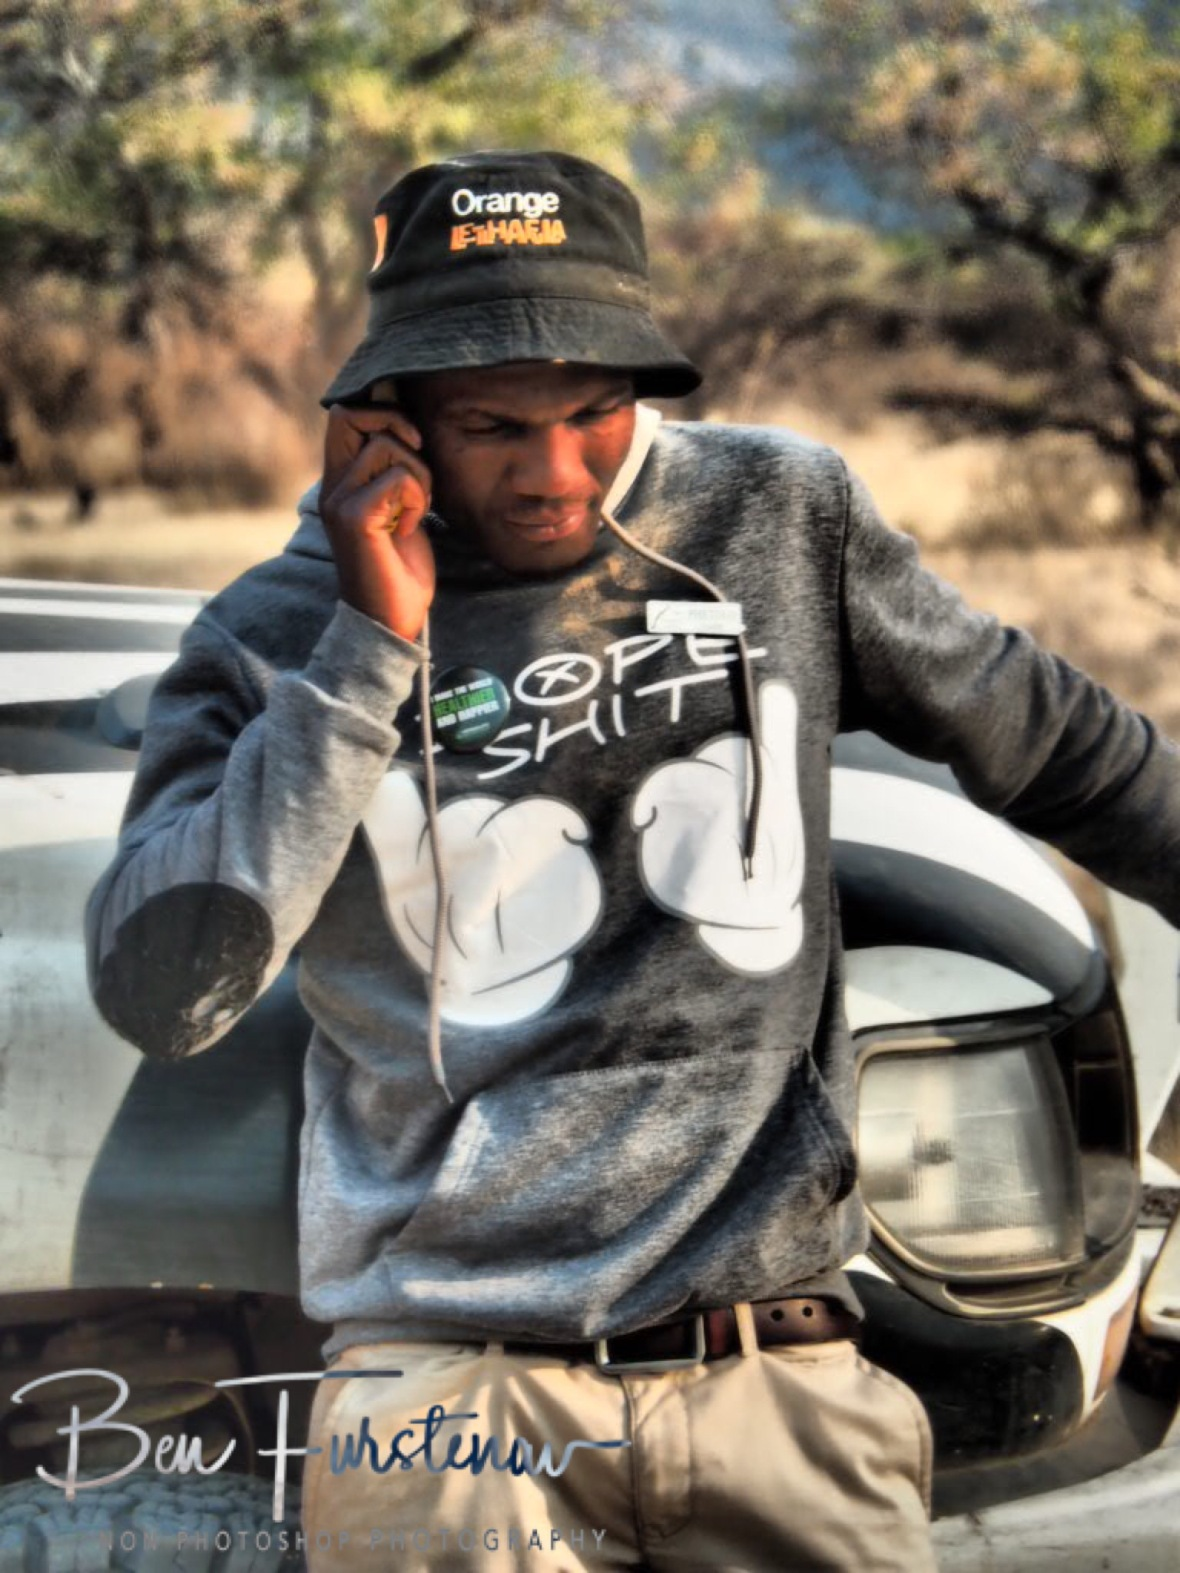 Poetolo making arrangements, Tsolido Hills, Botswana